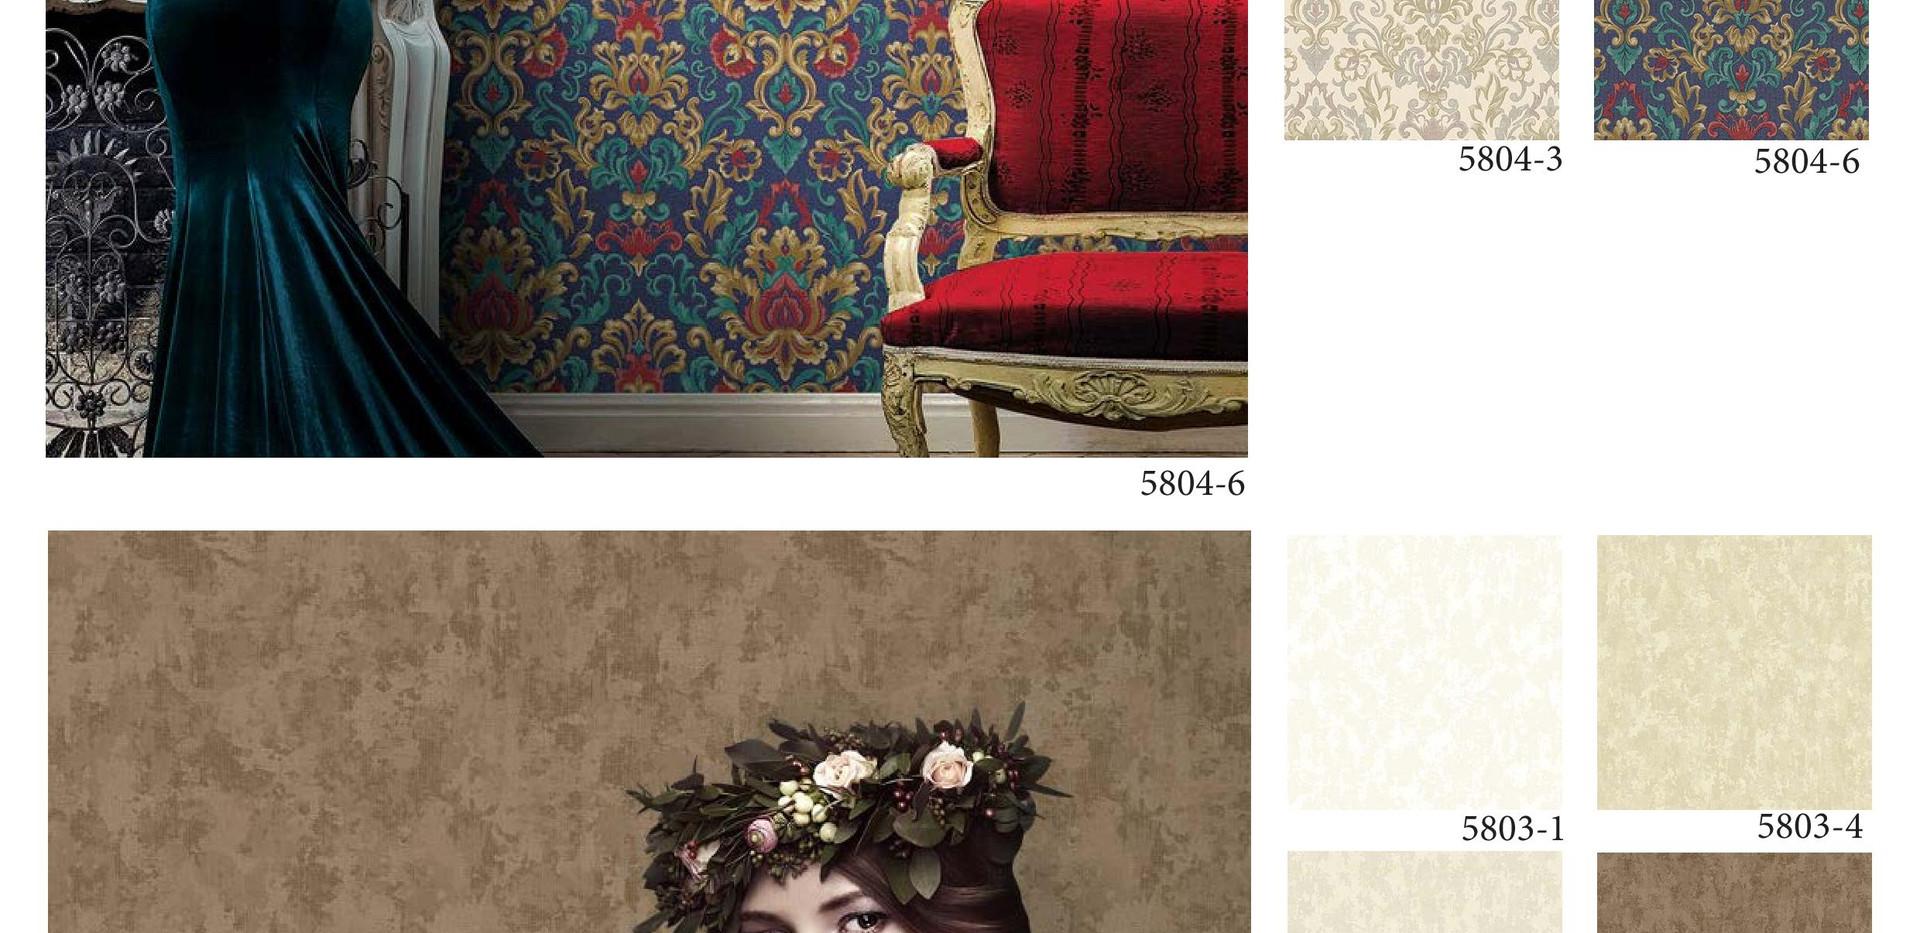 Kalinka katalog-page-003.jpg